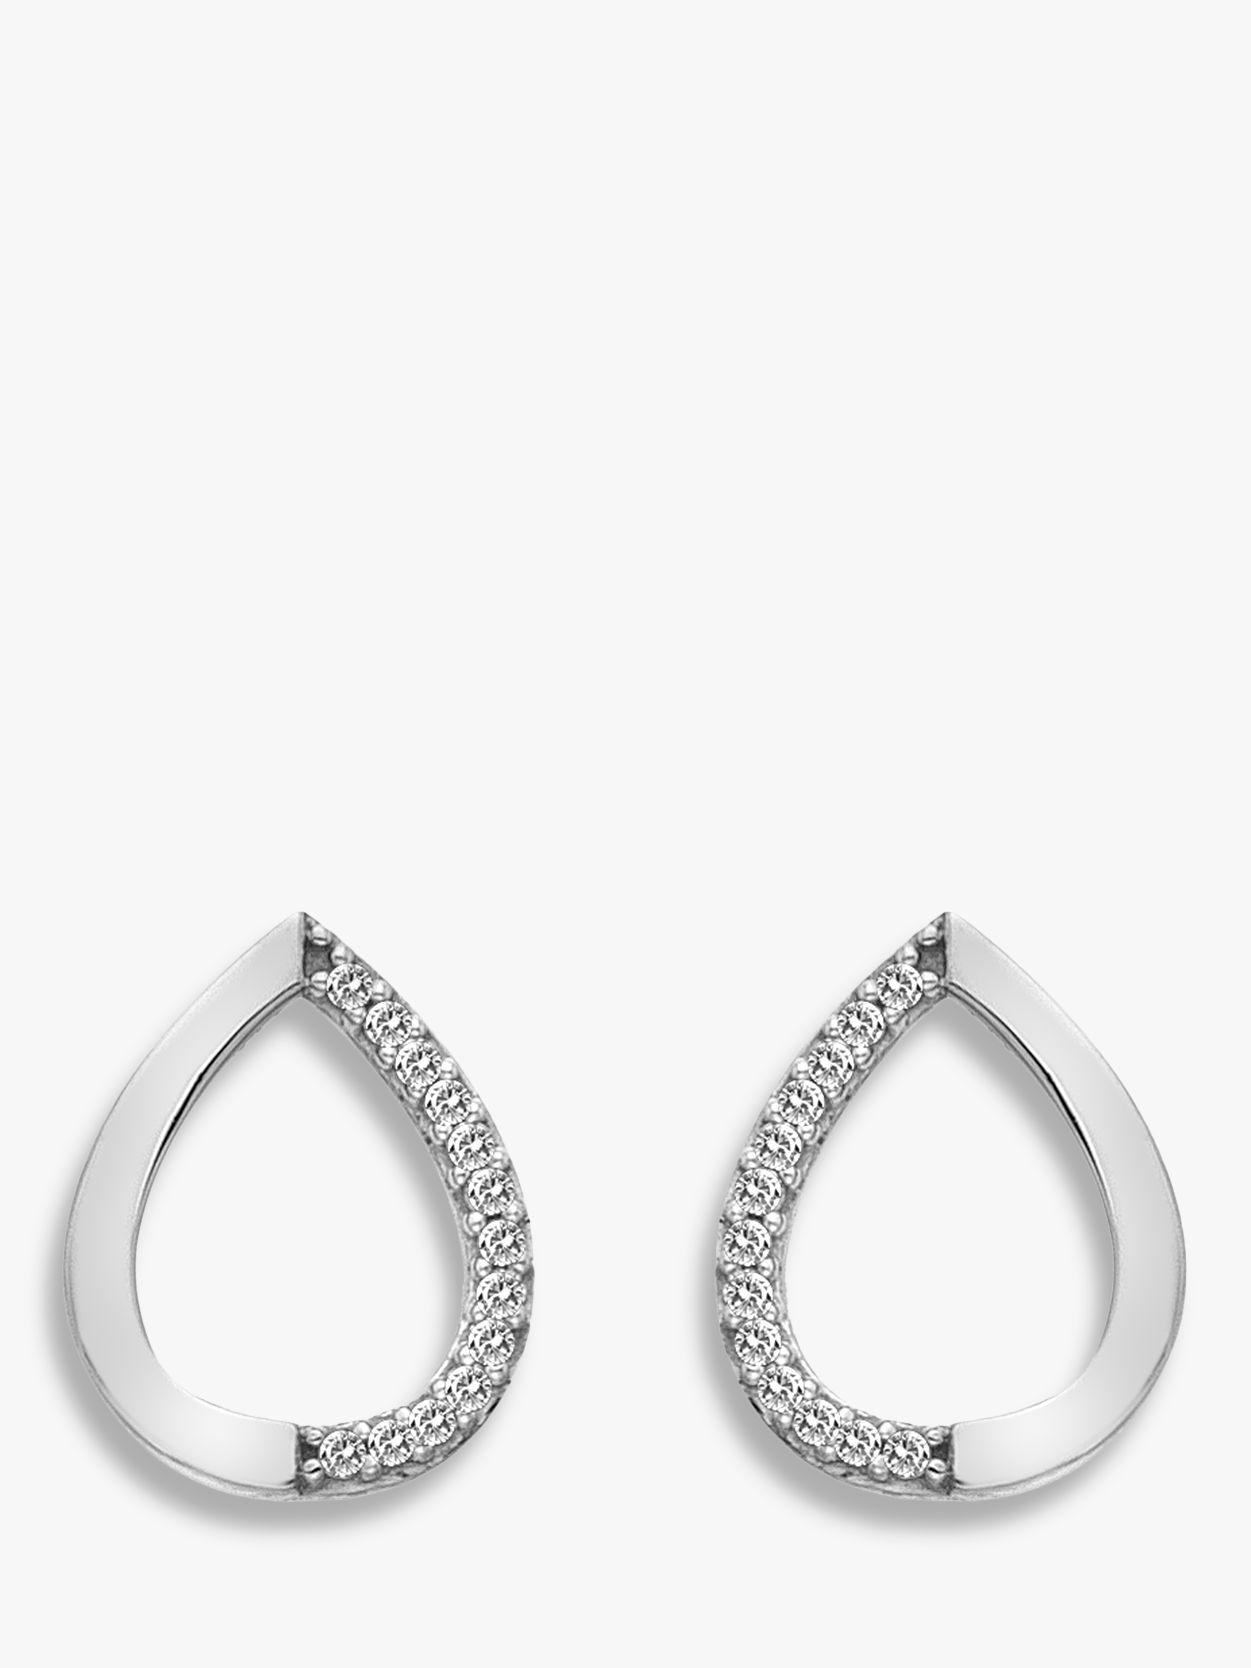 Hot Diamonds Hot Diamonds 9ct White Gold Teardrop Stud Earrings